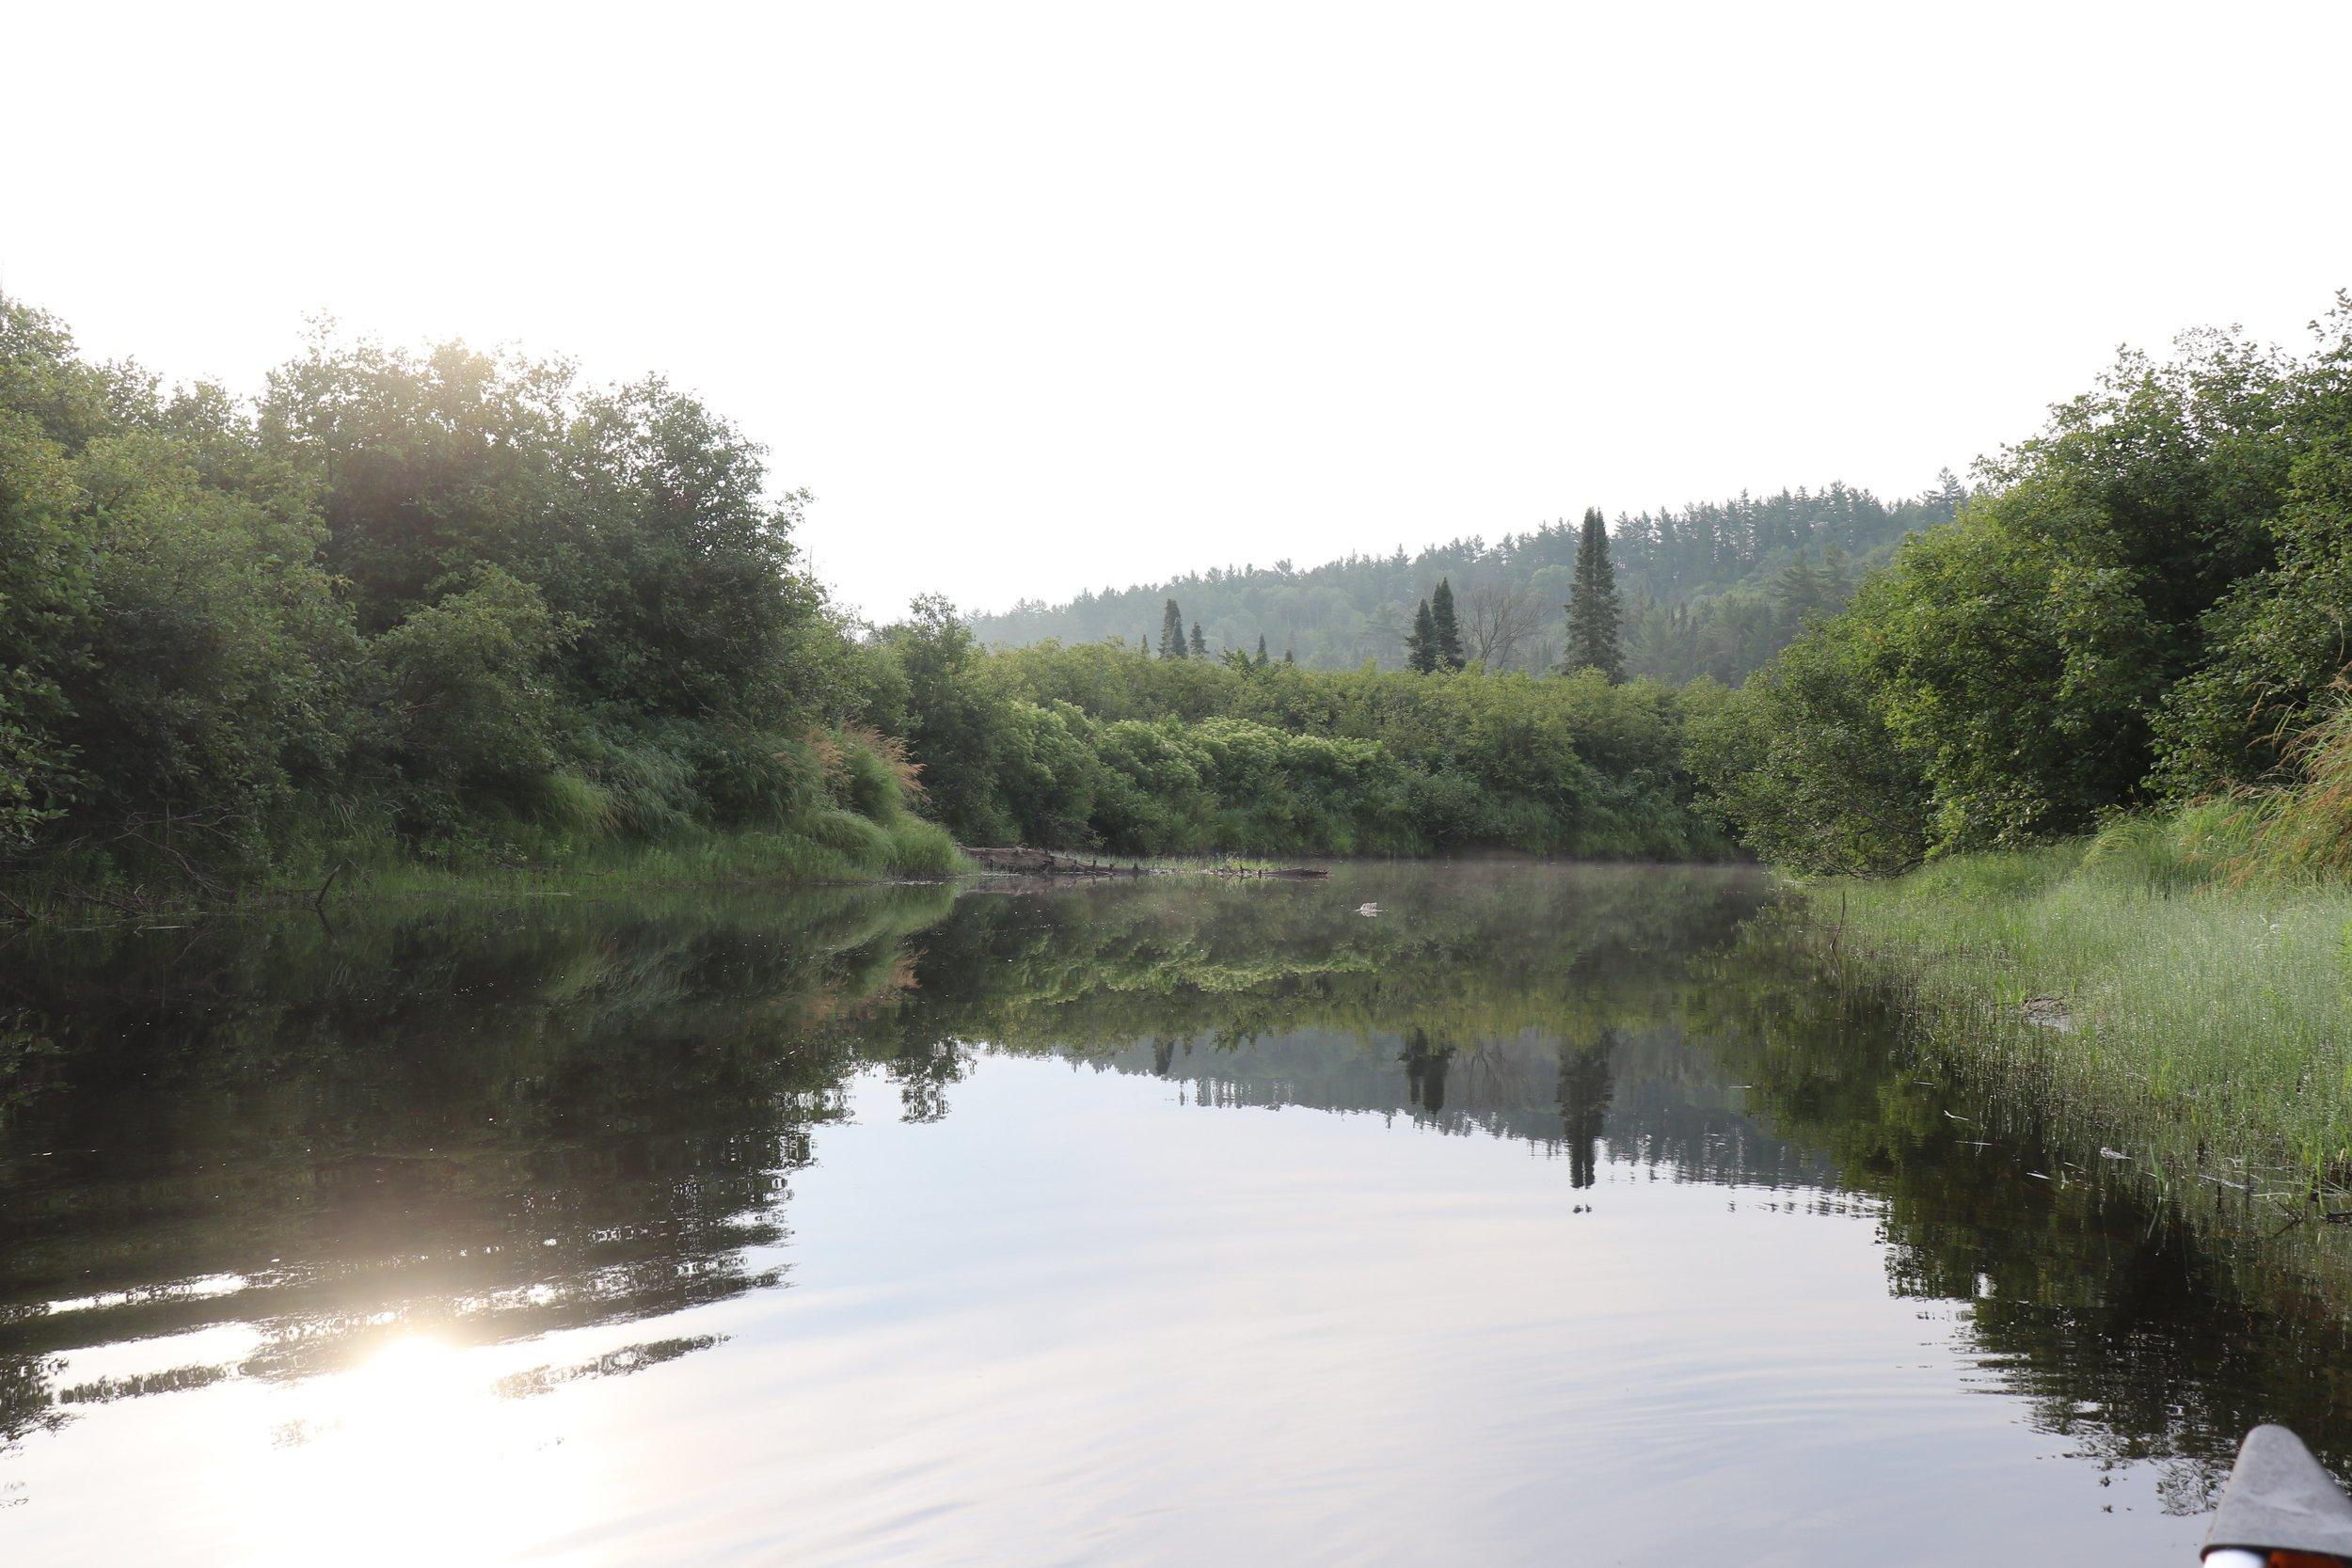 Beautiful morning paddle along the Nipissing River